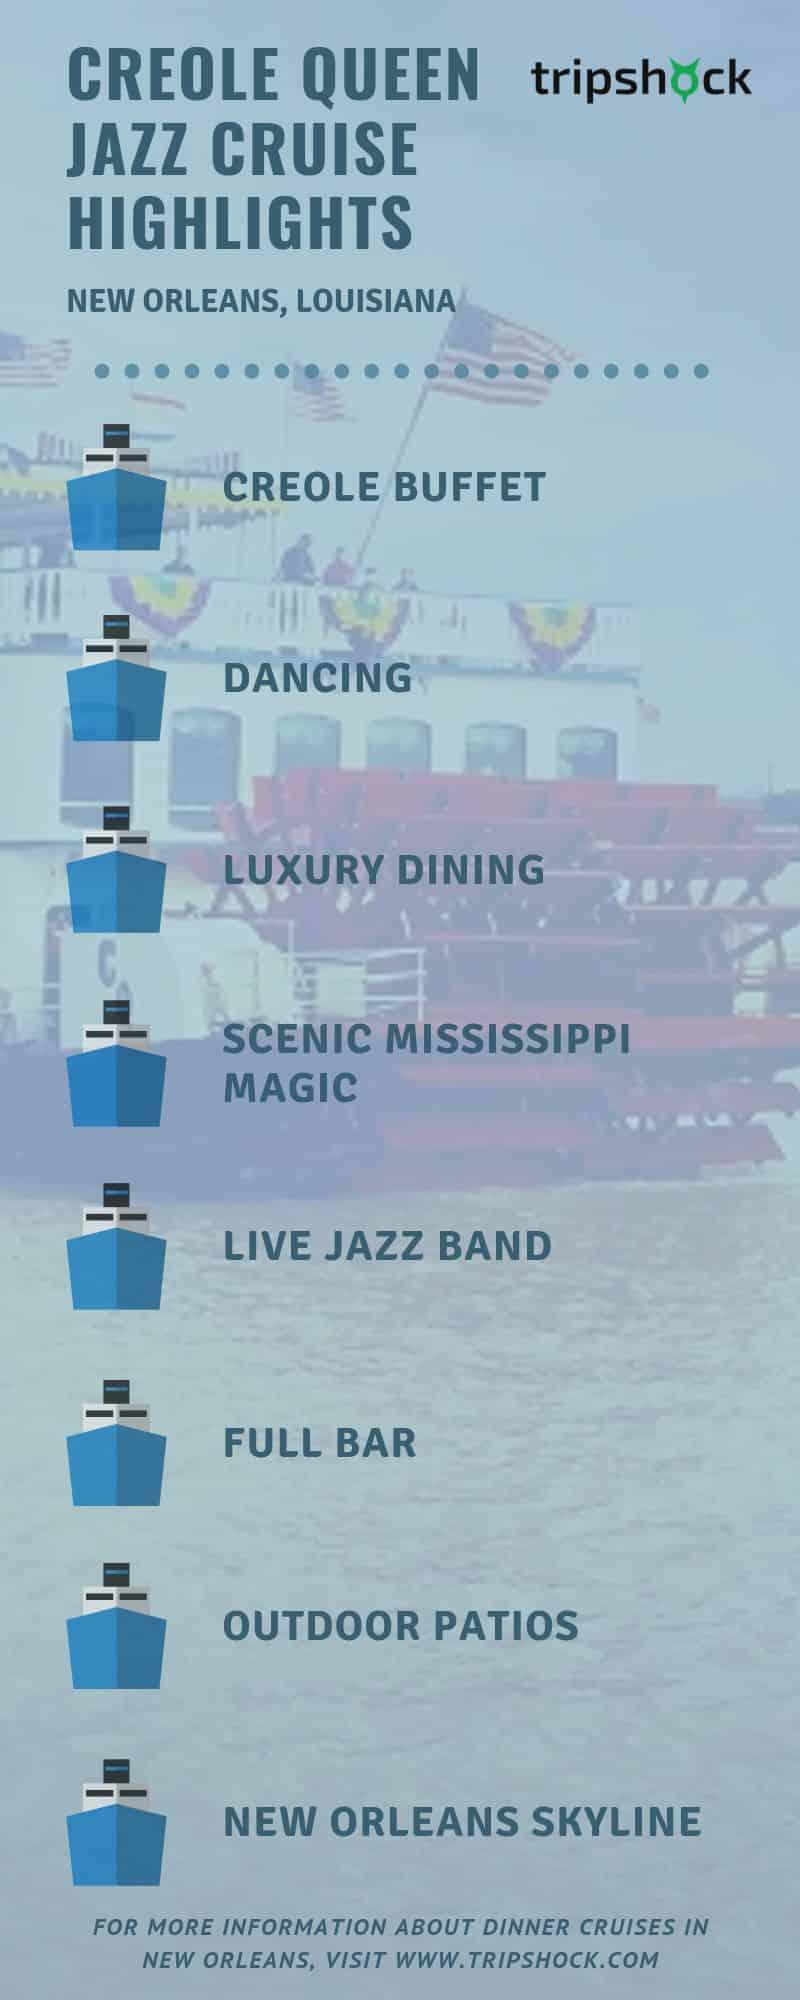 creole queen jazz cruise highlights